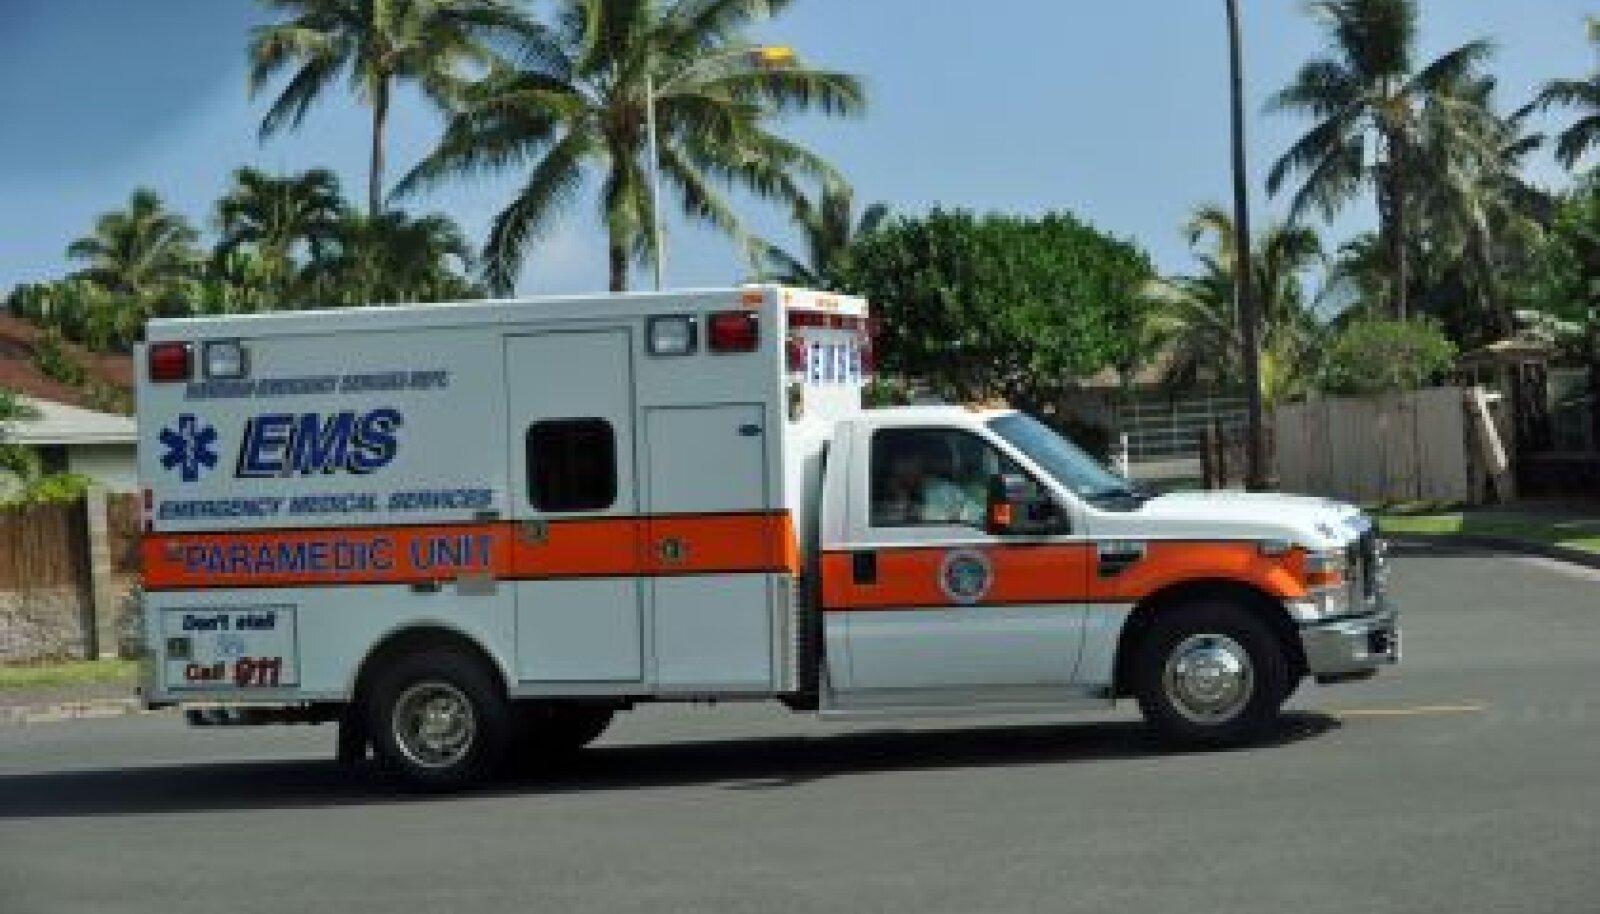 kiirabi Obama juures